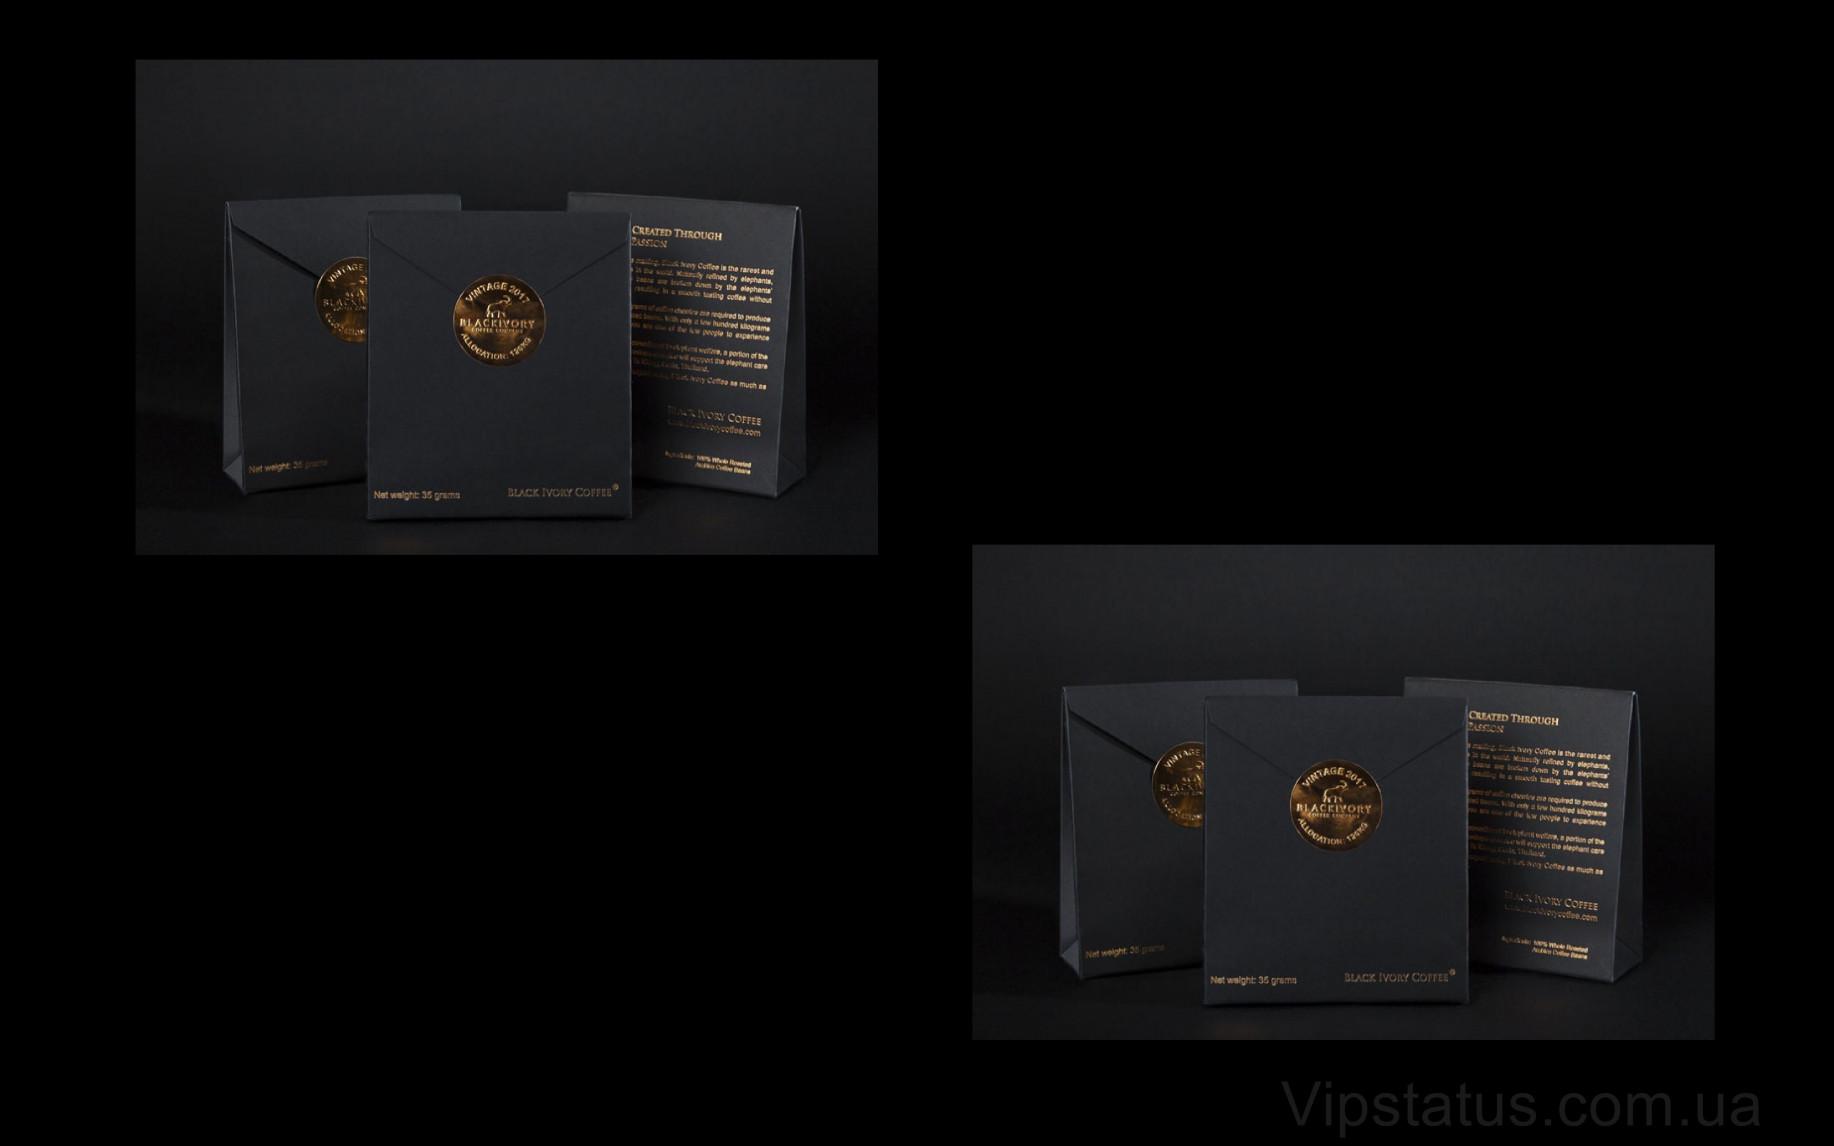 Elite Элитный Black Ivory Coffee 6 упаковок - по 35 грамм Elite Black Ivory Coffee 6 packs - 35 grams each (30 cups of coffee) image 1